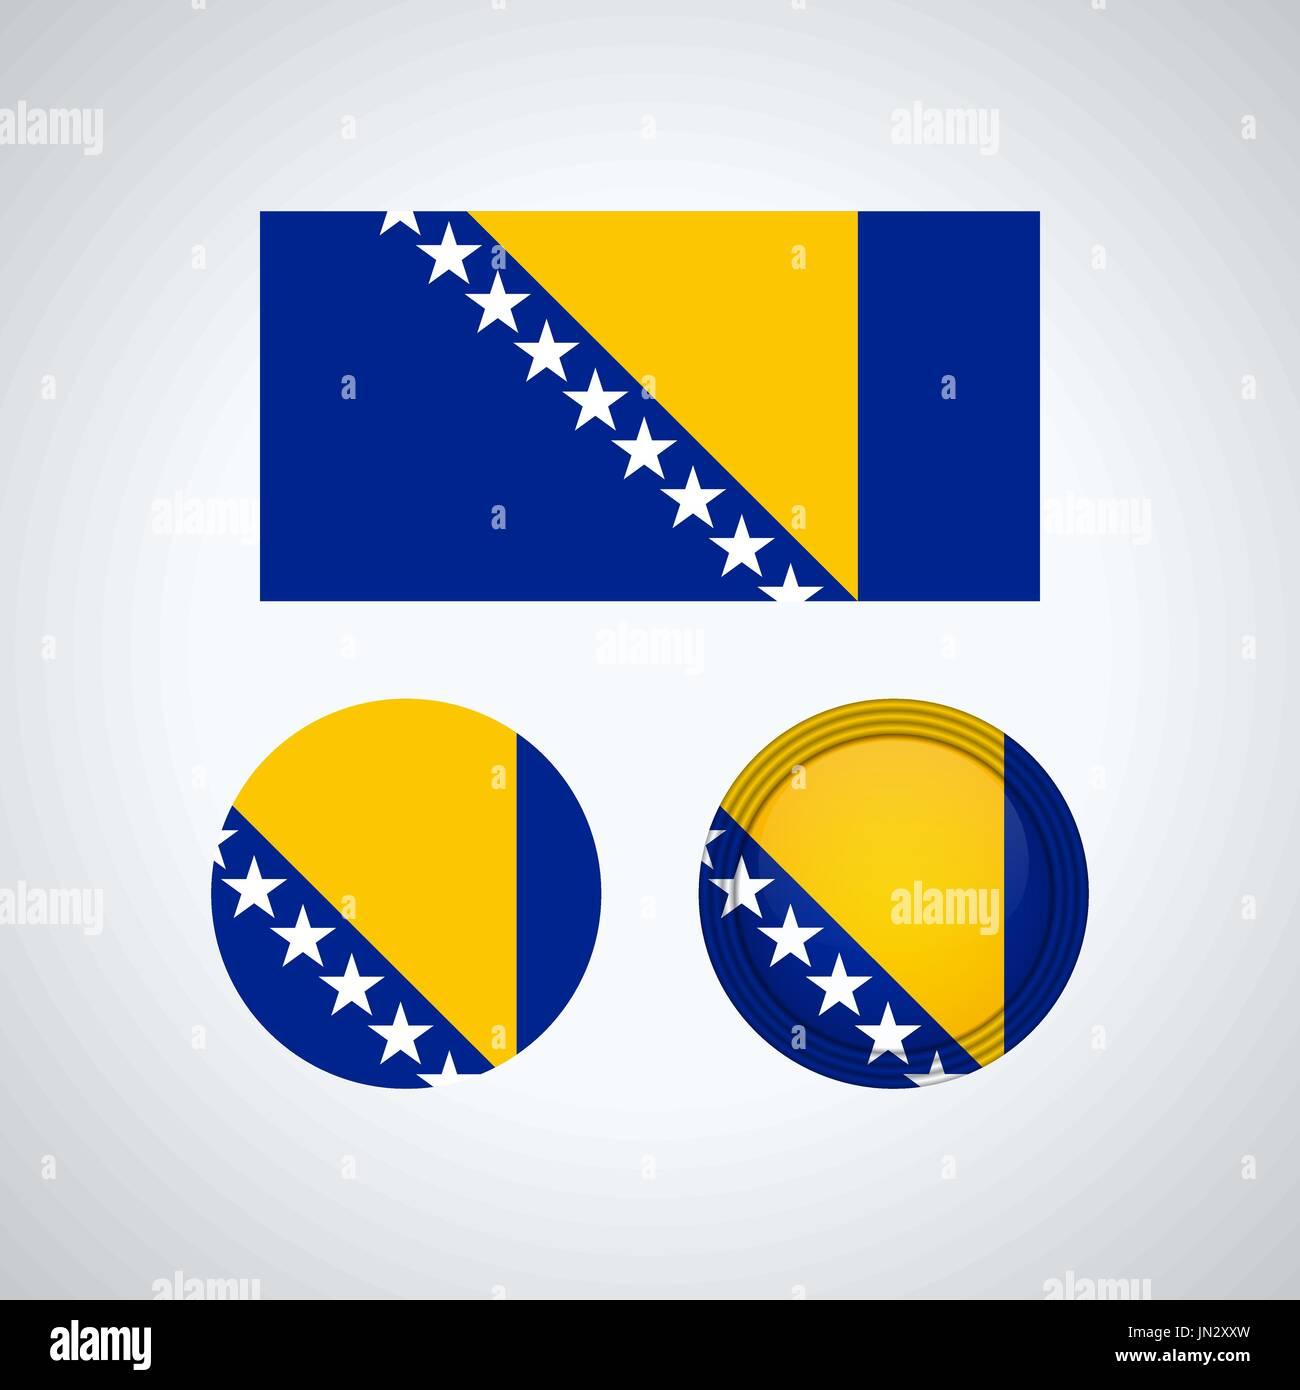 Flag design. Bosnia Herzegovina flag set. Isolated template for your designs. Vector illustration. - Stock Vector